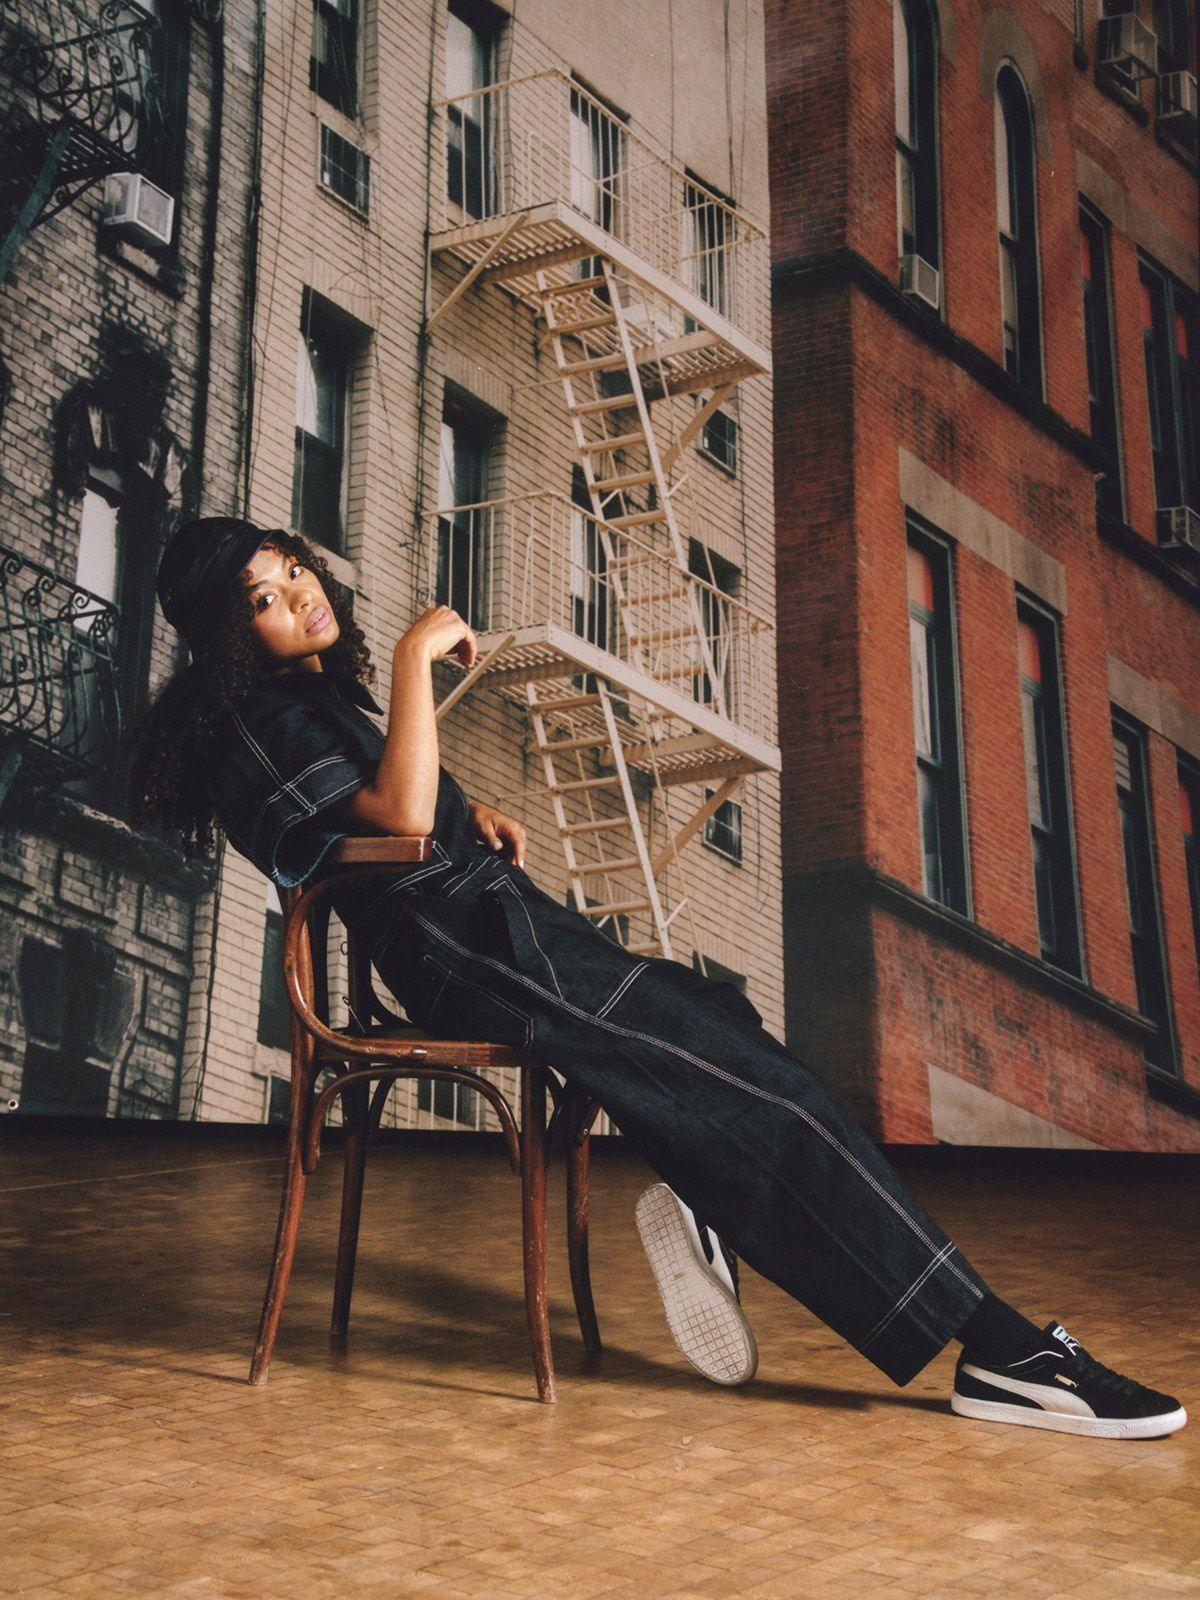 Meet June Ambrose, the Genius Behind the Craziest '90s Hip-Hop Fits 22